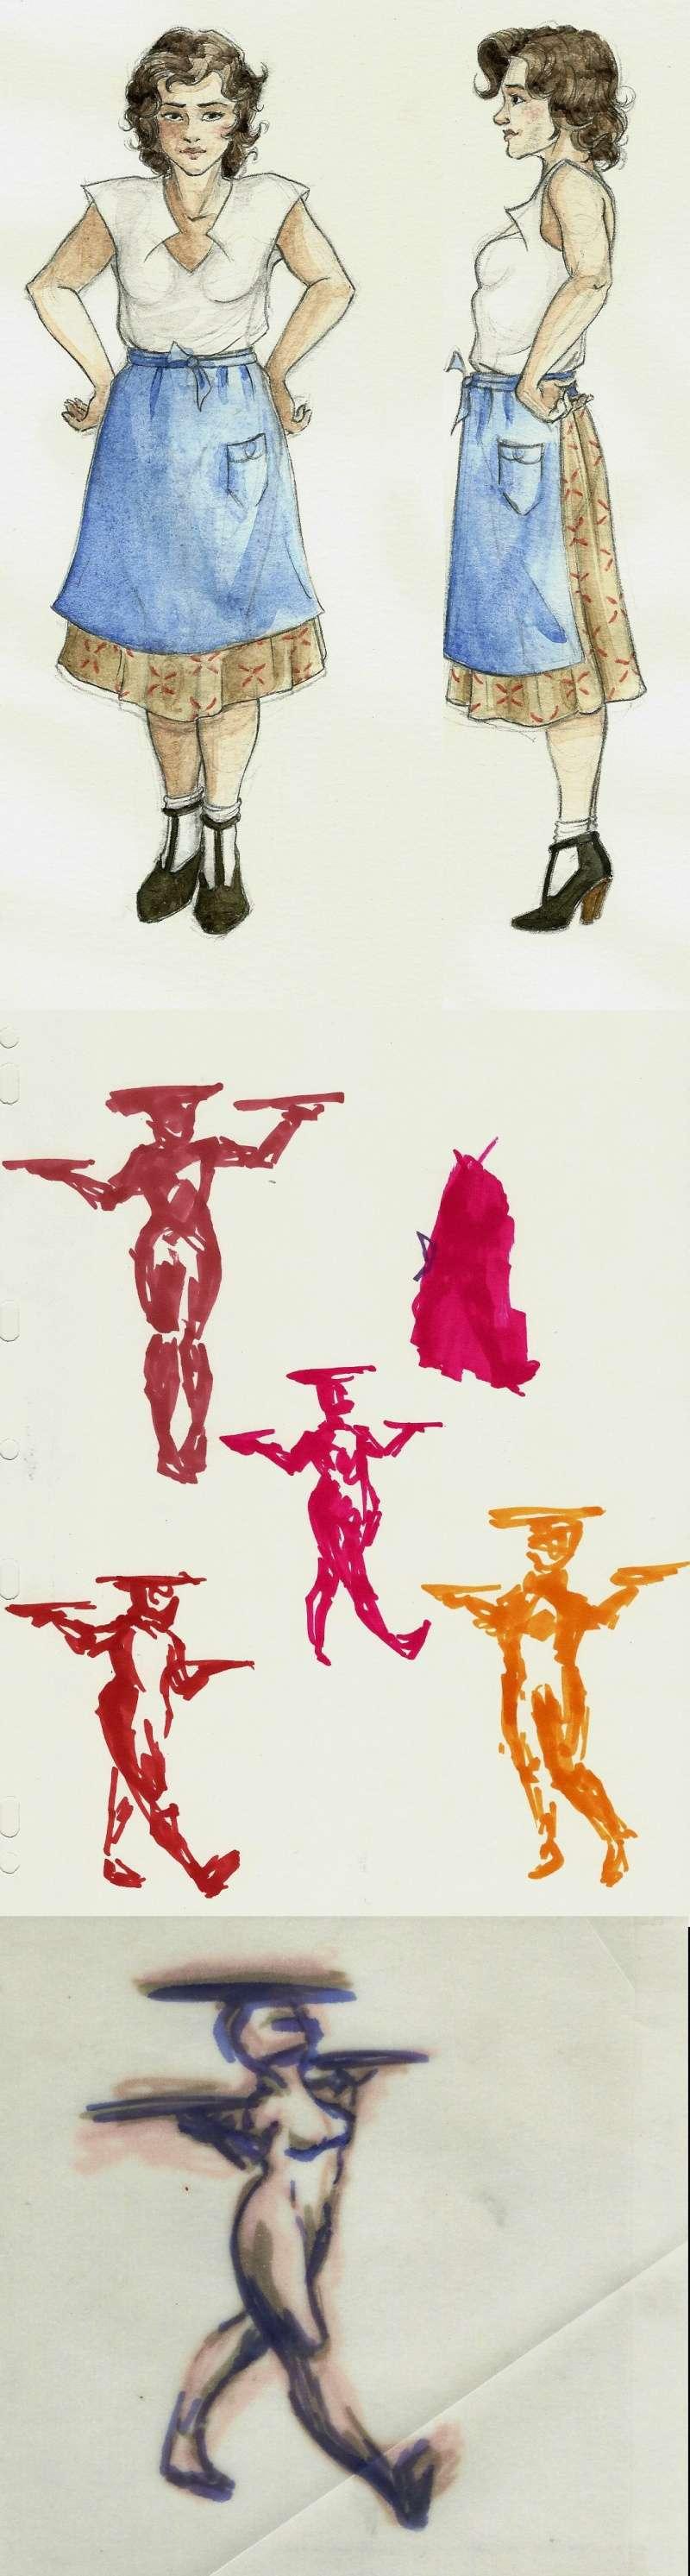 Retrouvailles - sculpture Croqui23